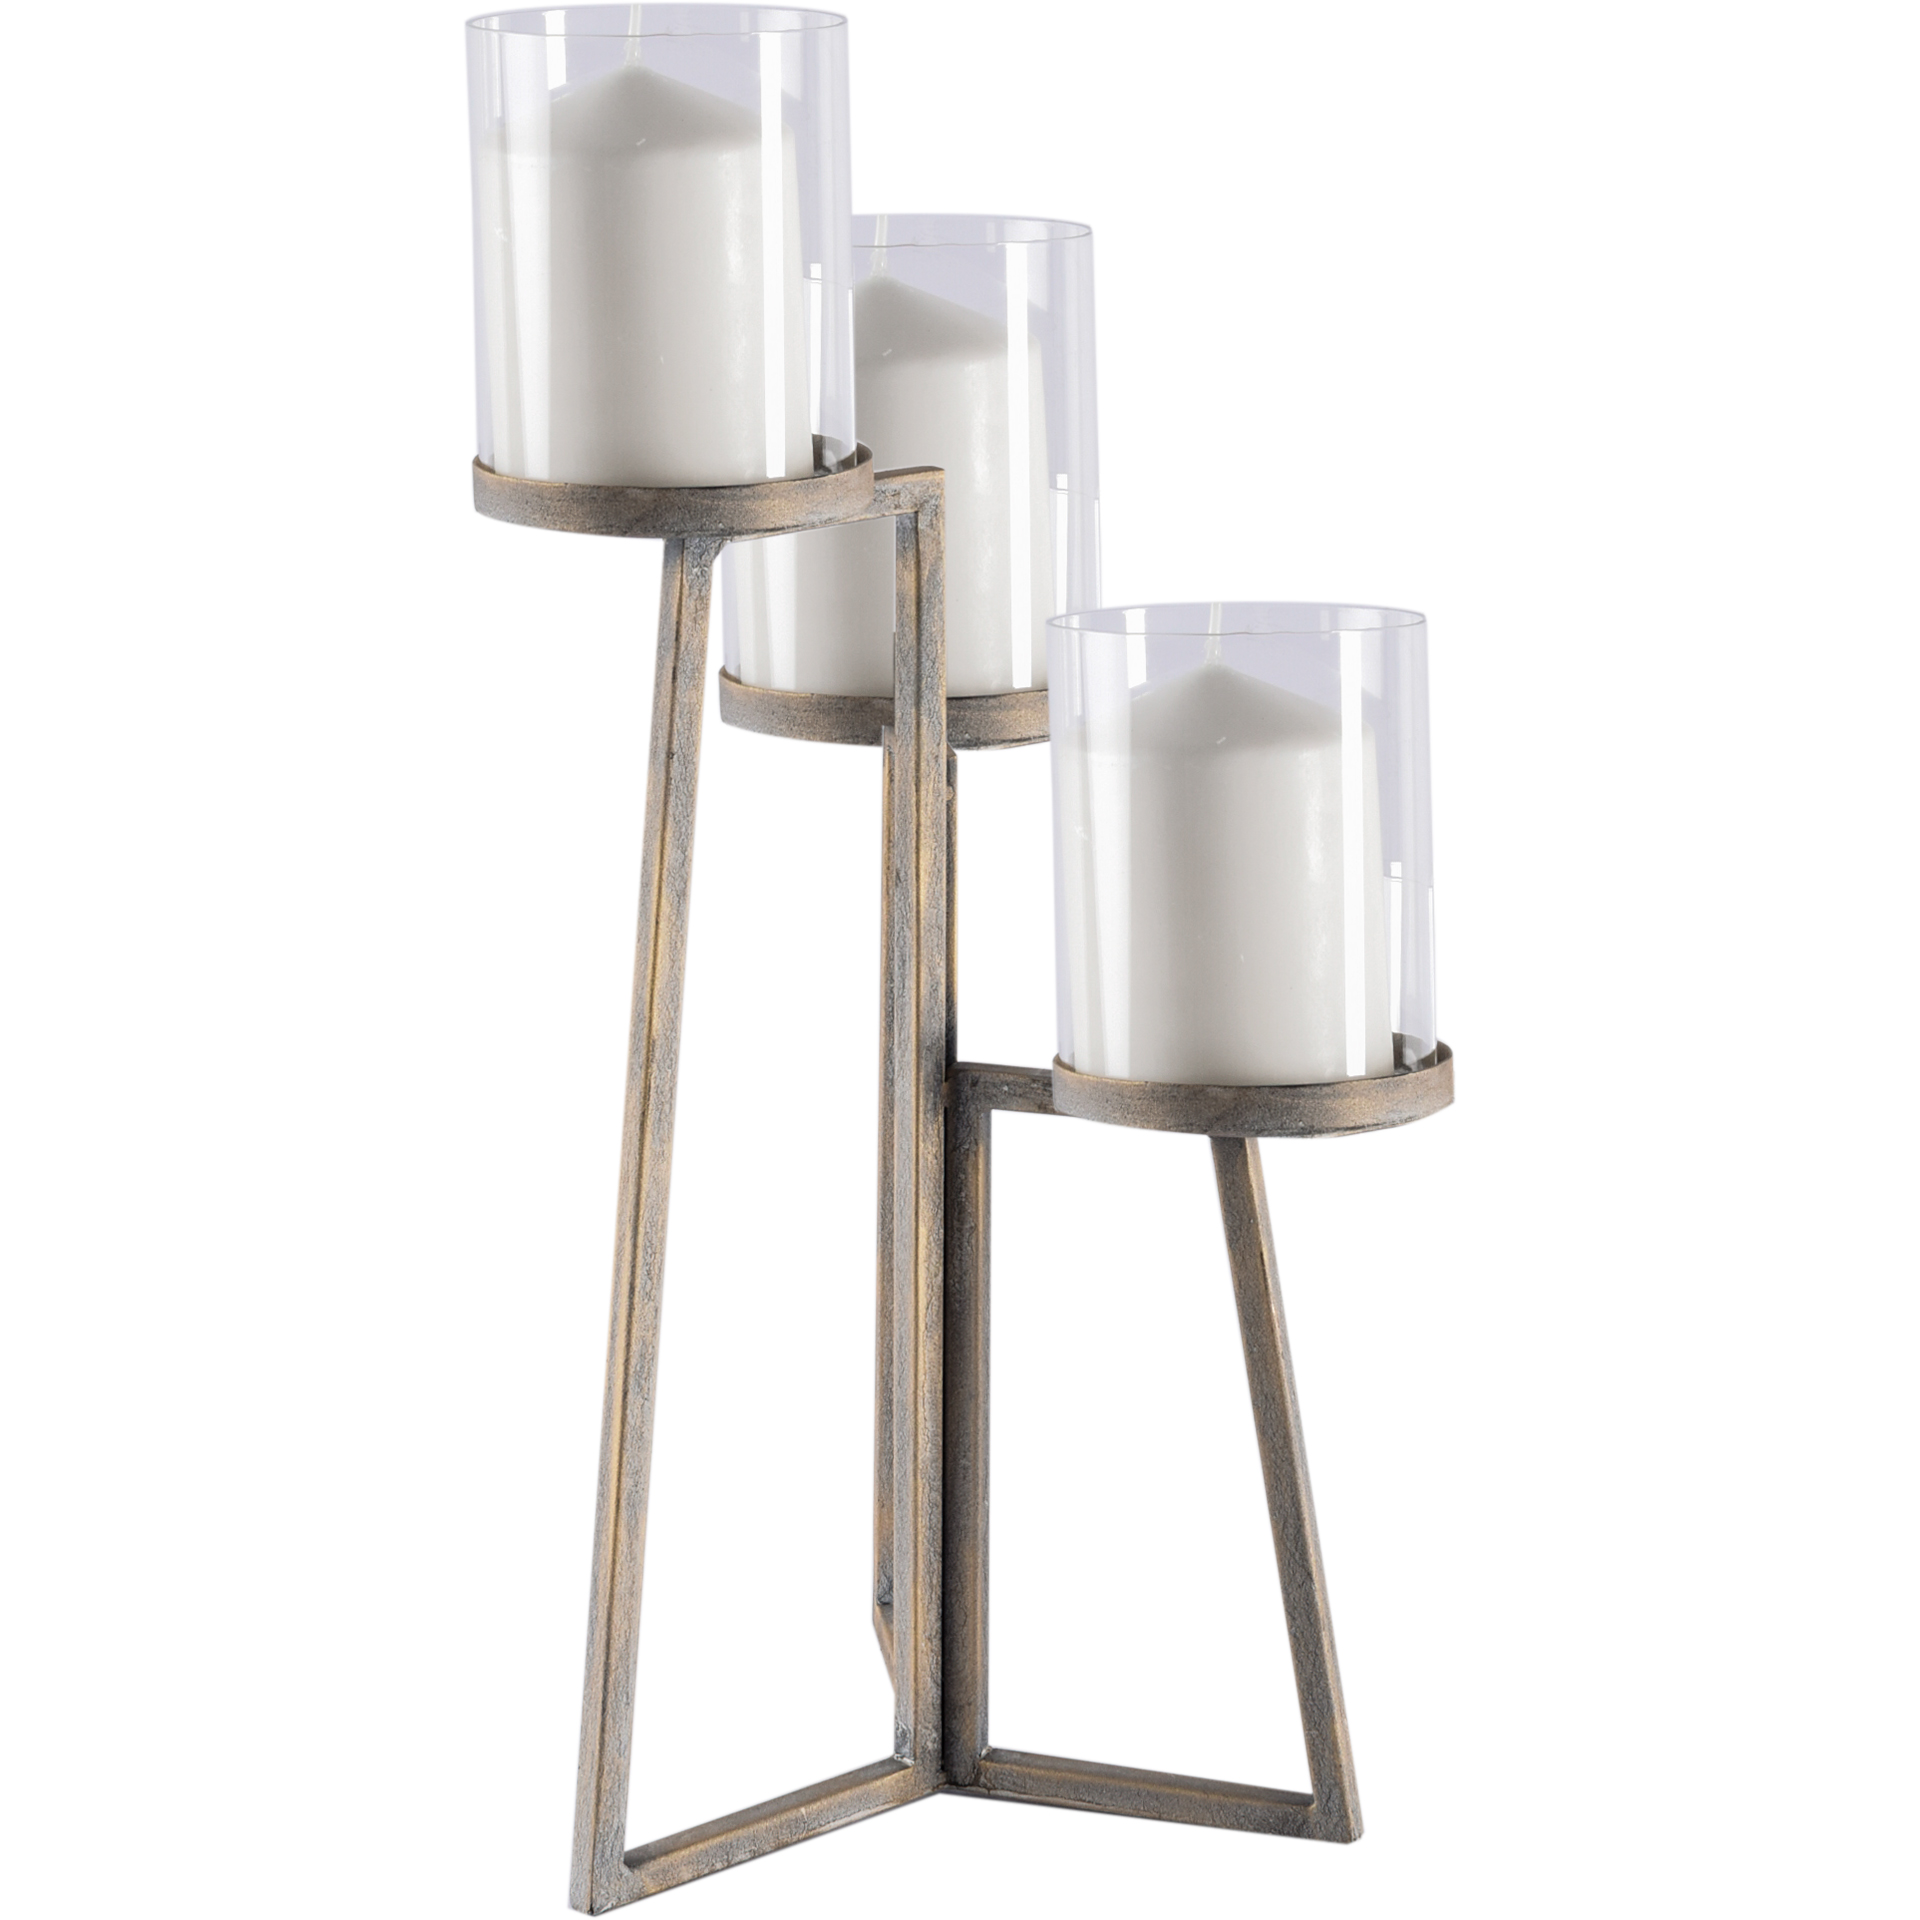 Mercana Modern Candle Holder With Brass Finish 67217 Walmart Com Walmart Com